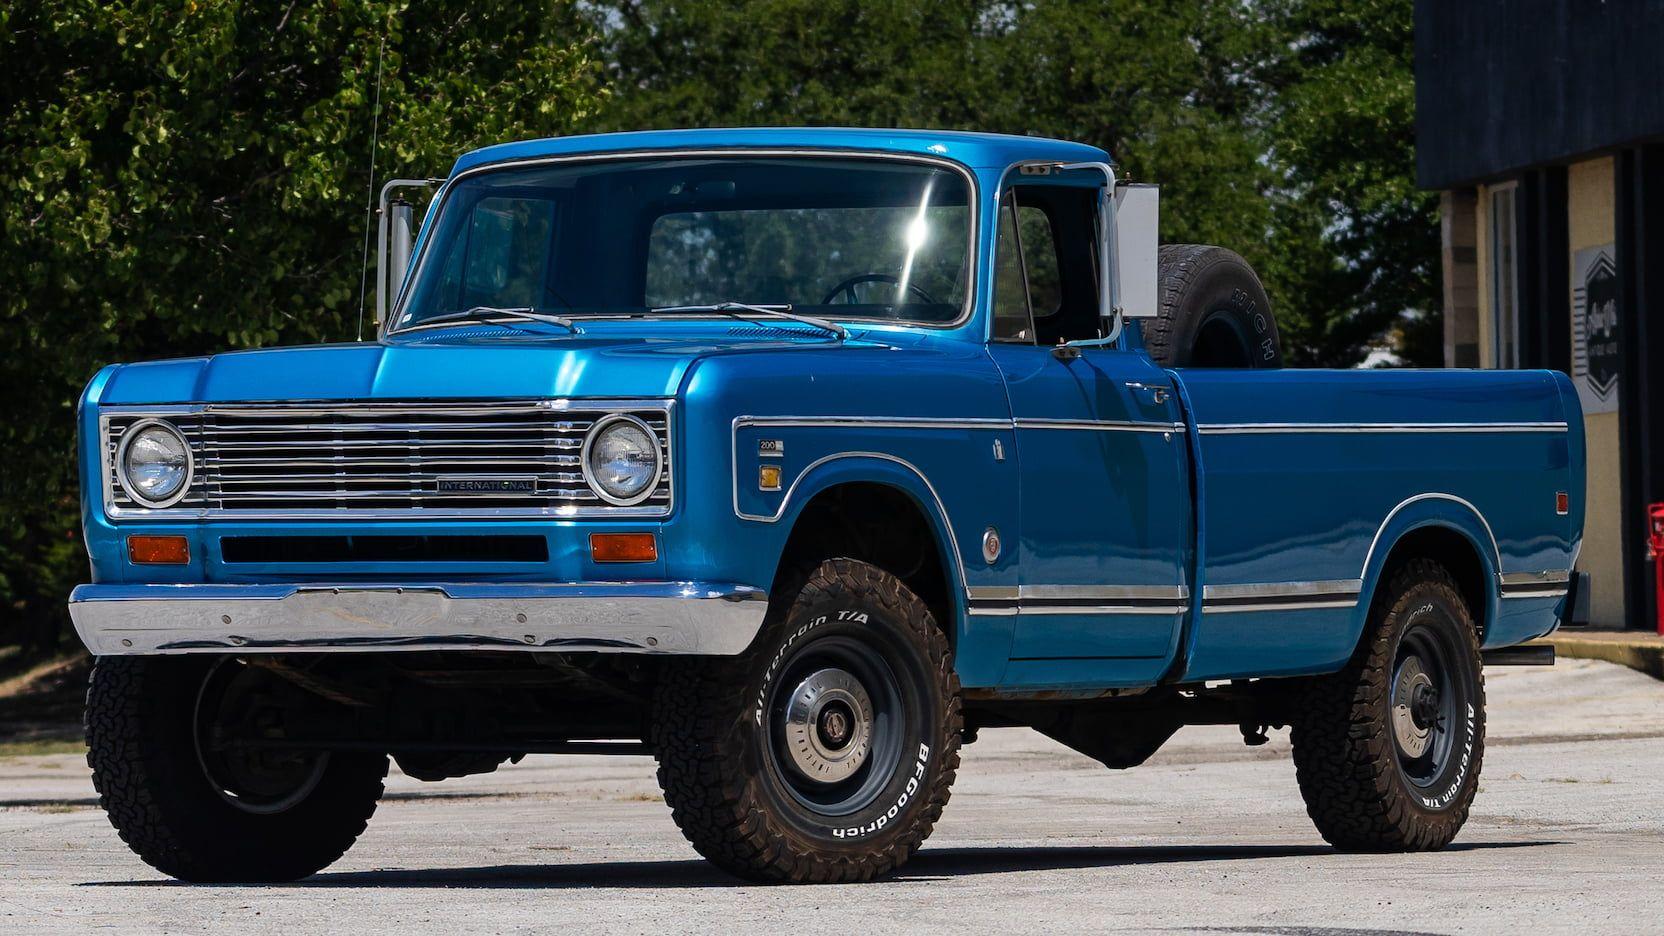 1974 International 200 Pickup F16 Dallas 2018 in 2020